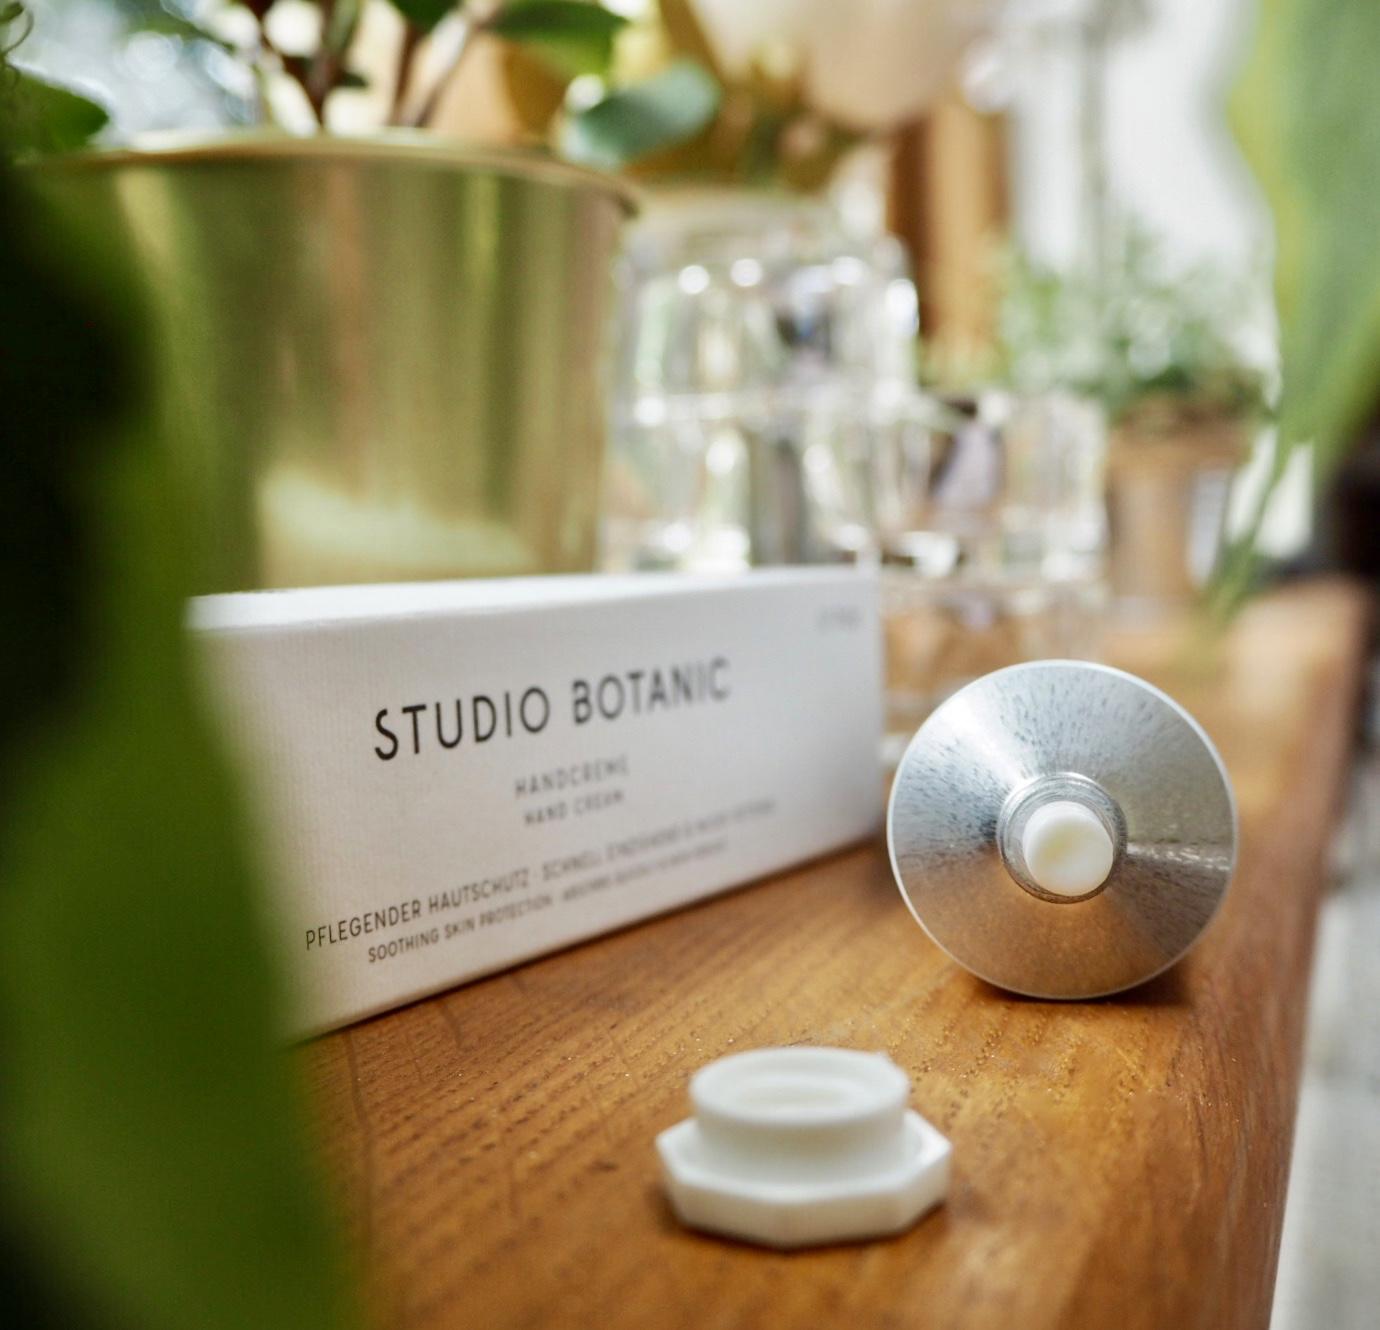 Studio Botanic – Naturally, Conscious Hand Care